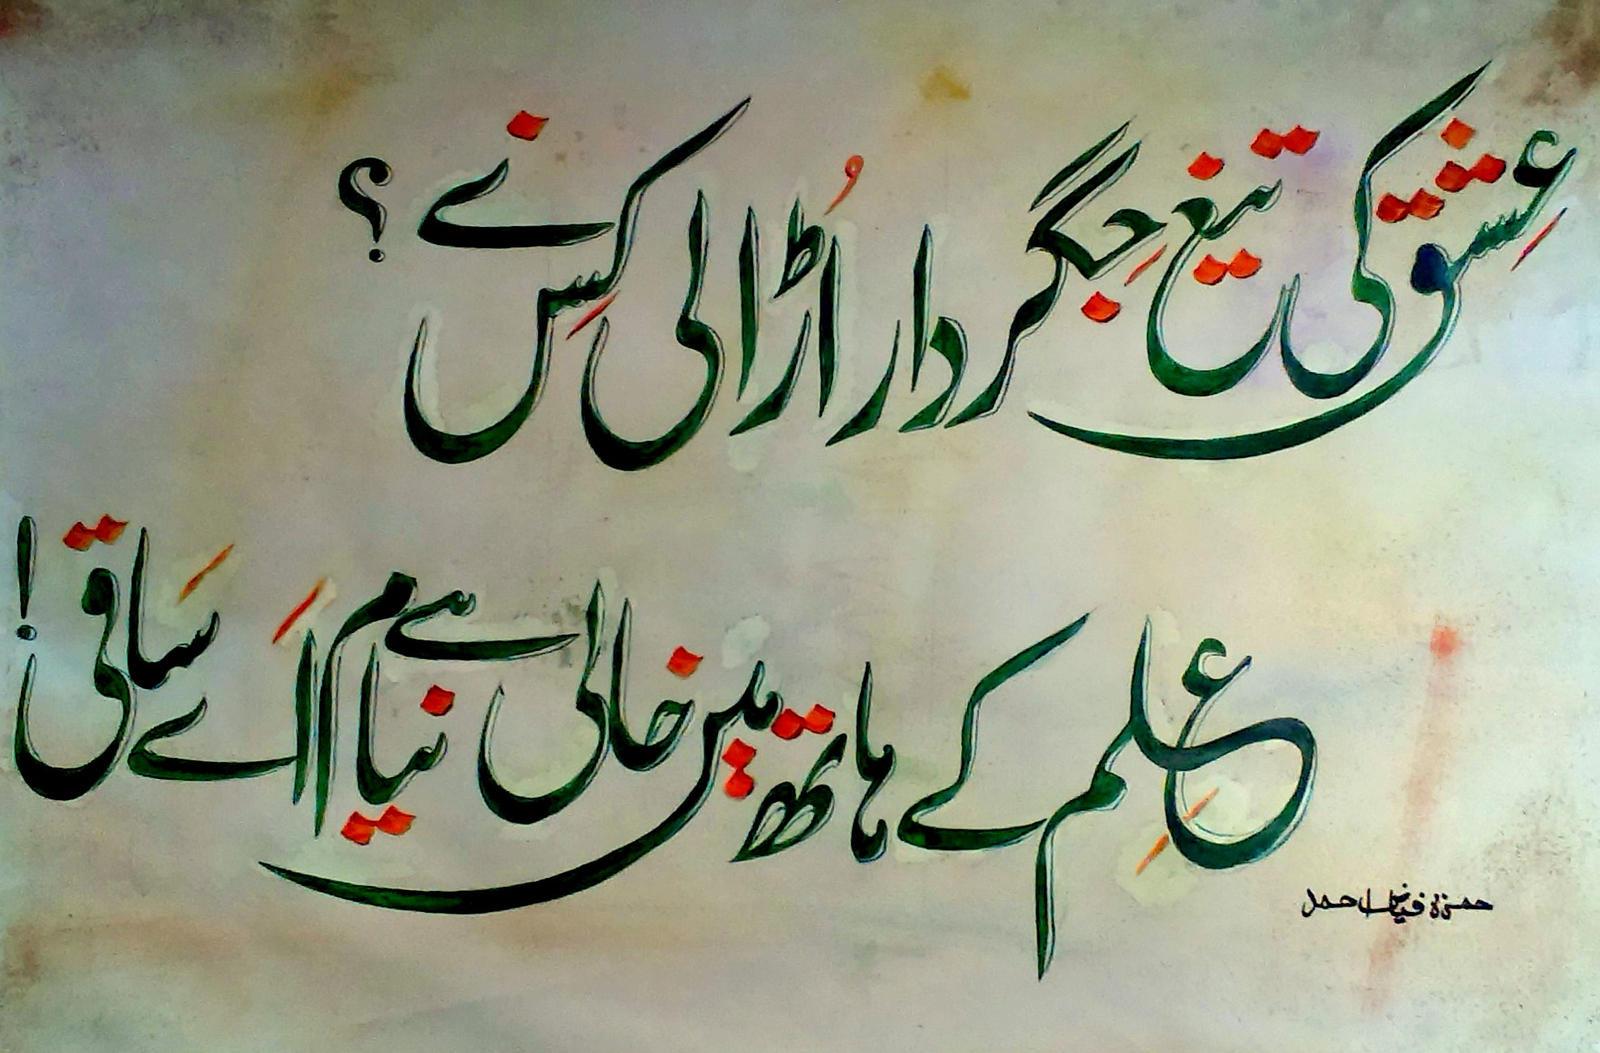 Urdu Calligraphy By Hamzfahmed On Deviantart